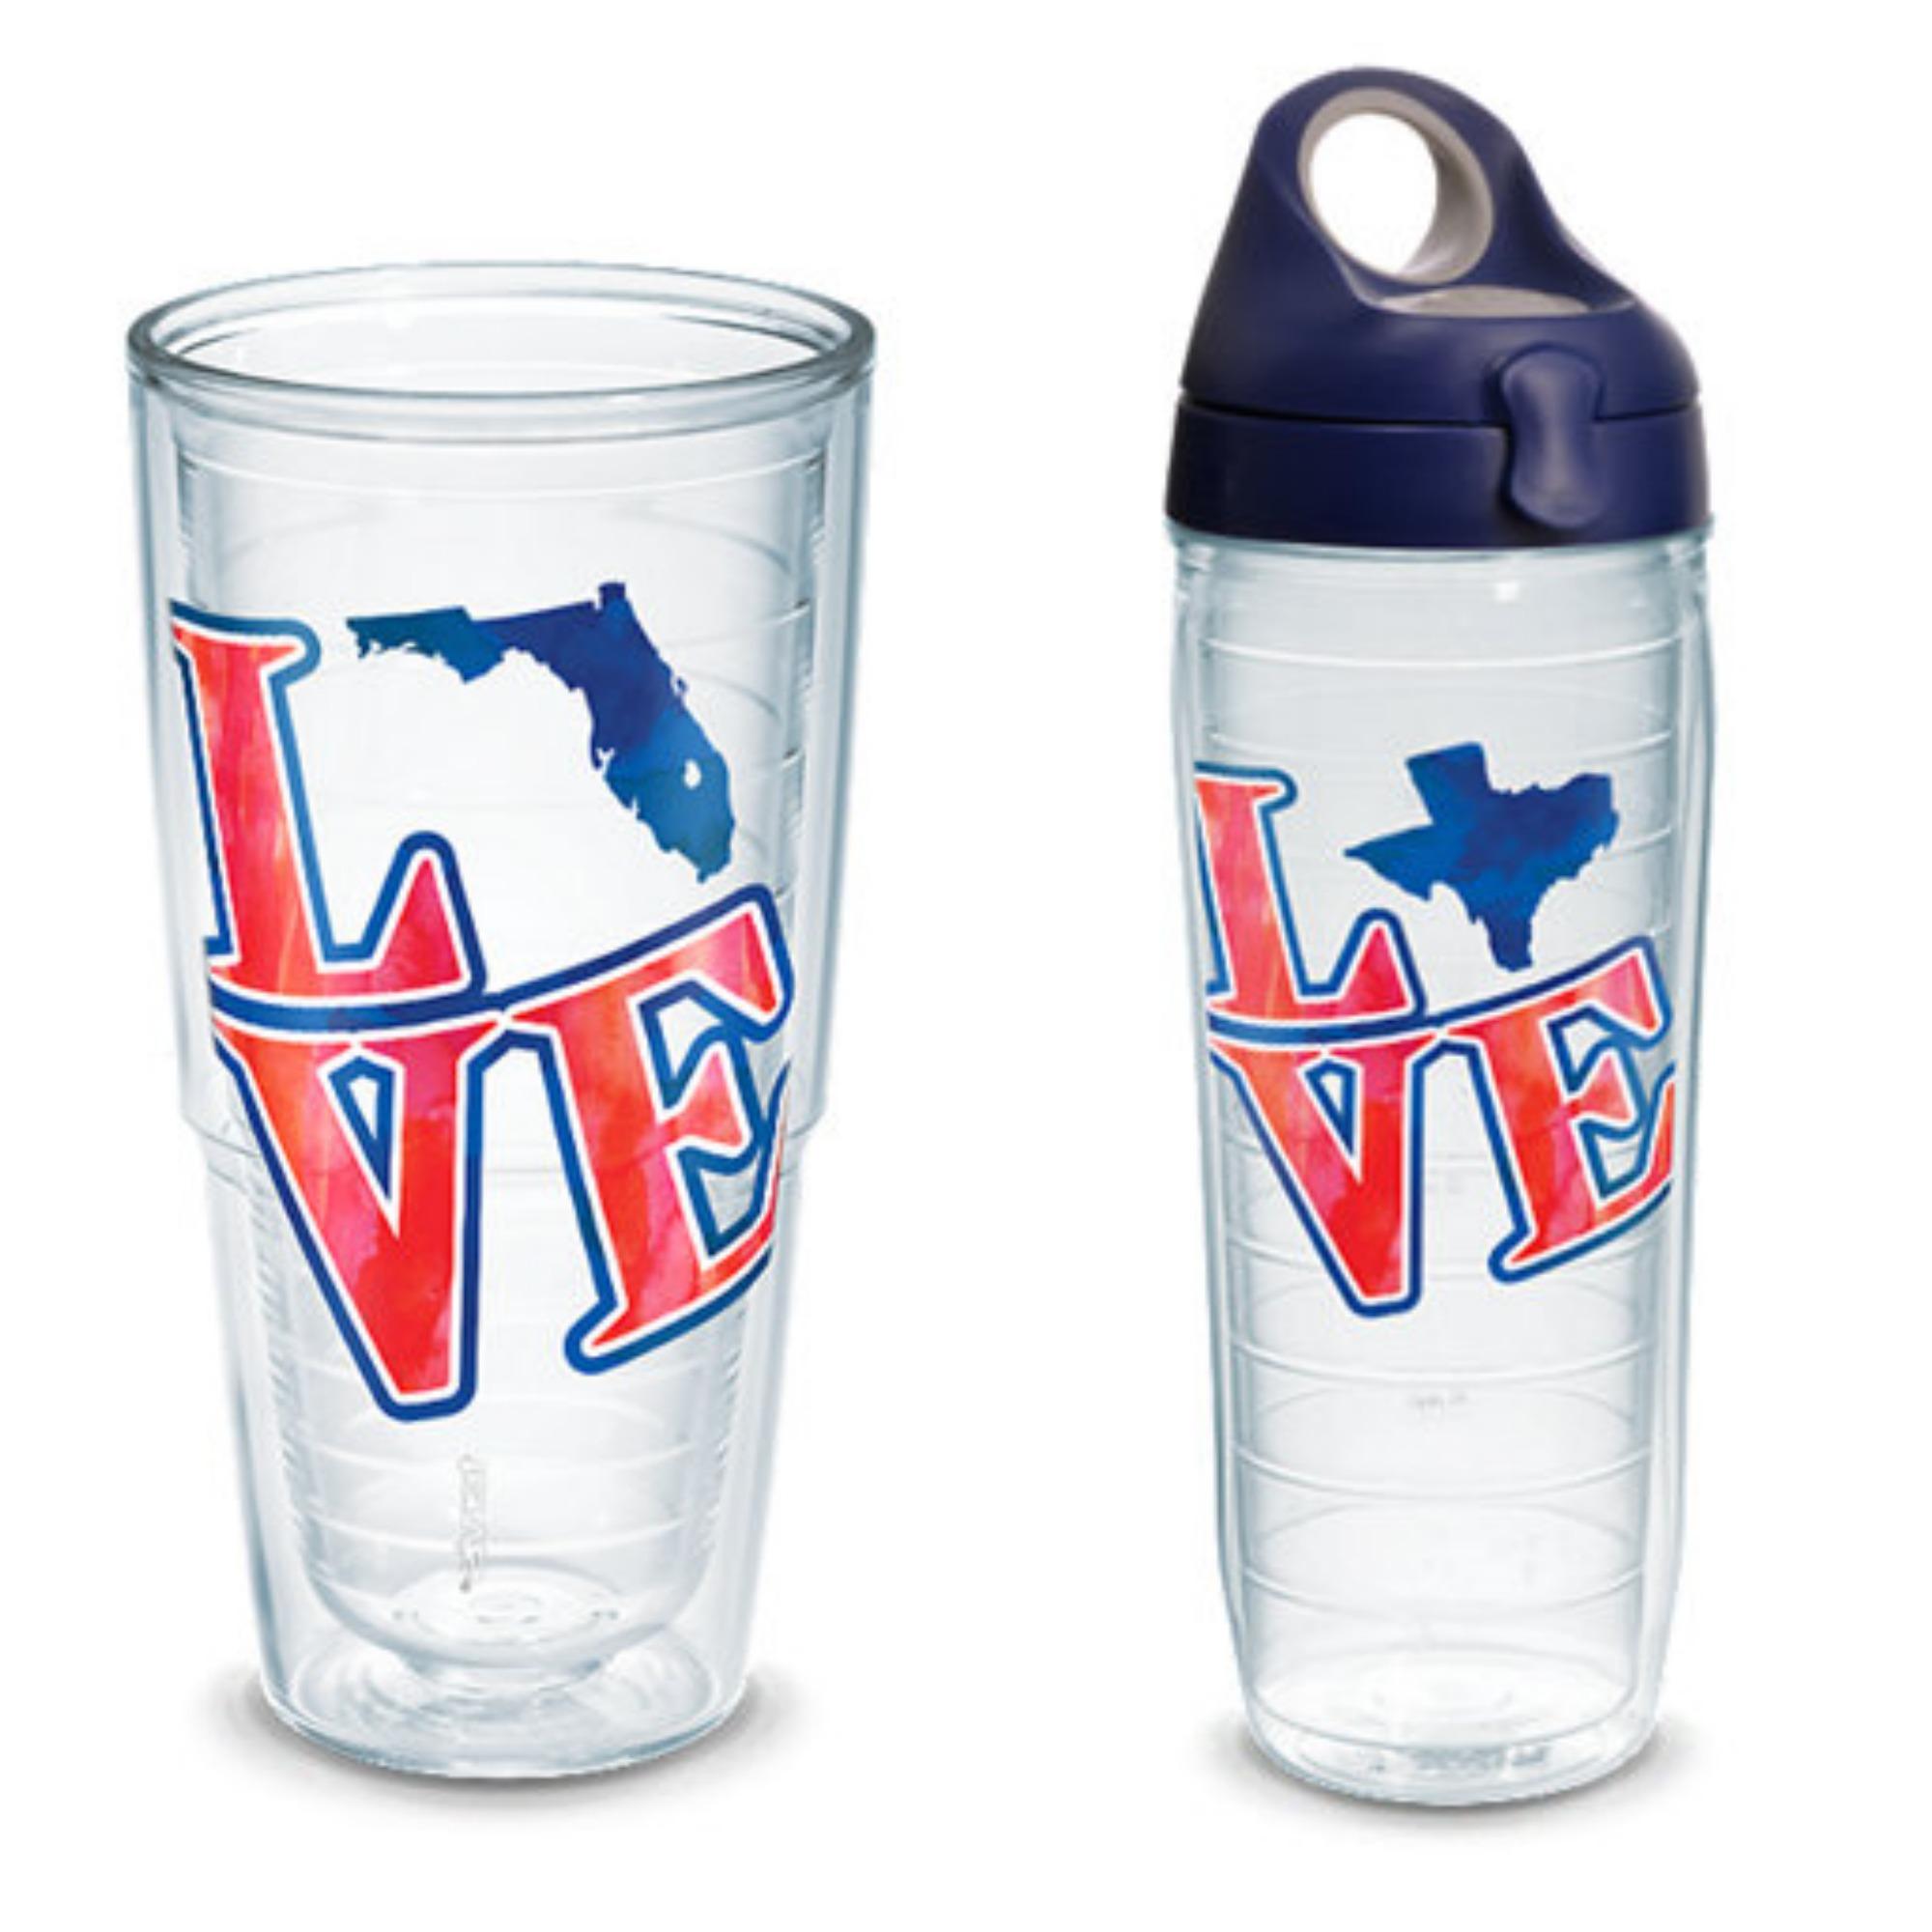 LOVE FL LOVE TX tervis tumblers